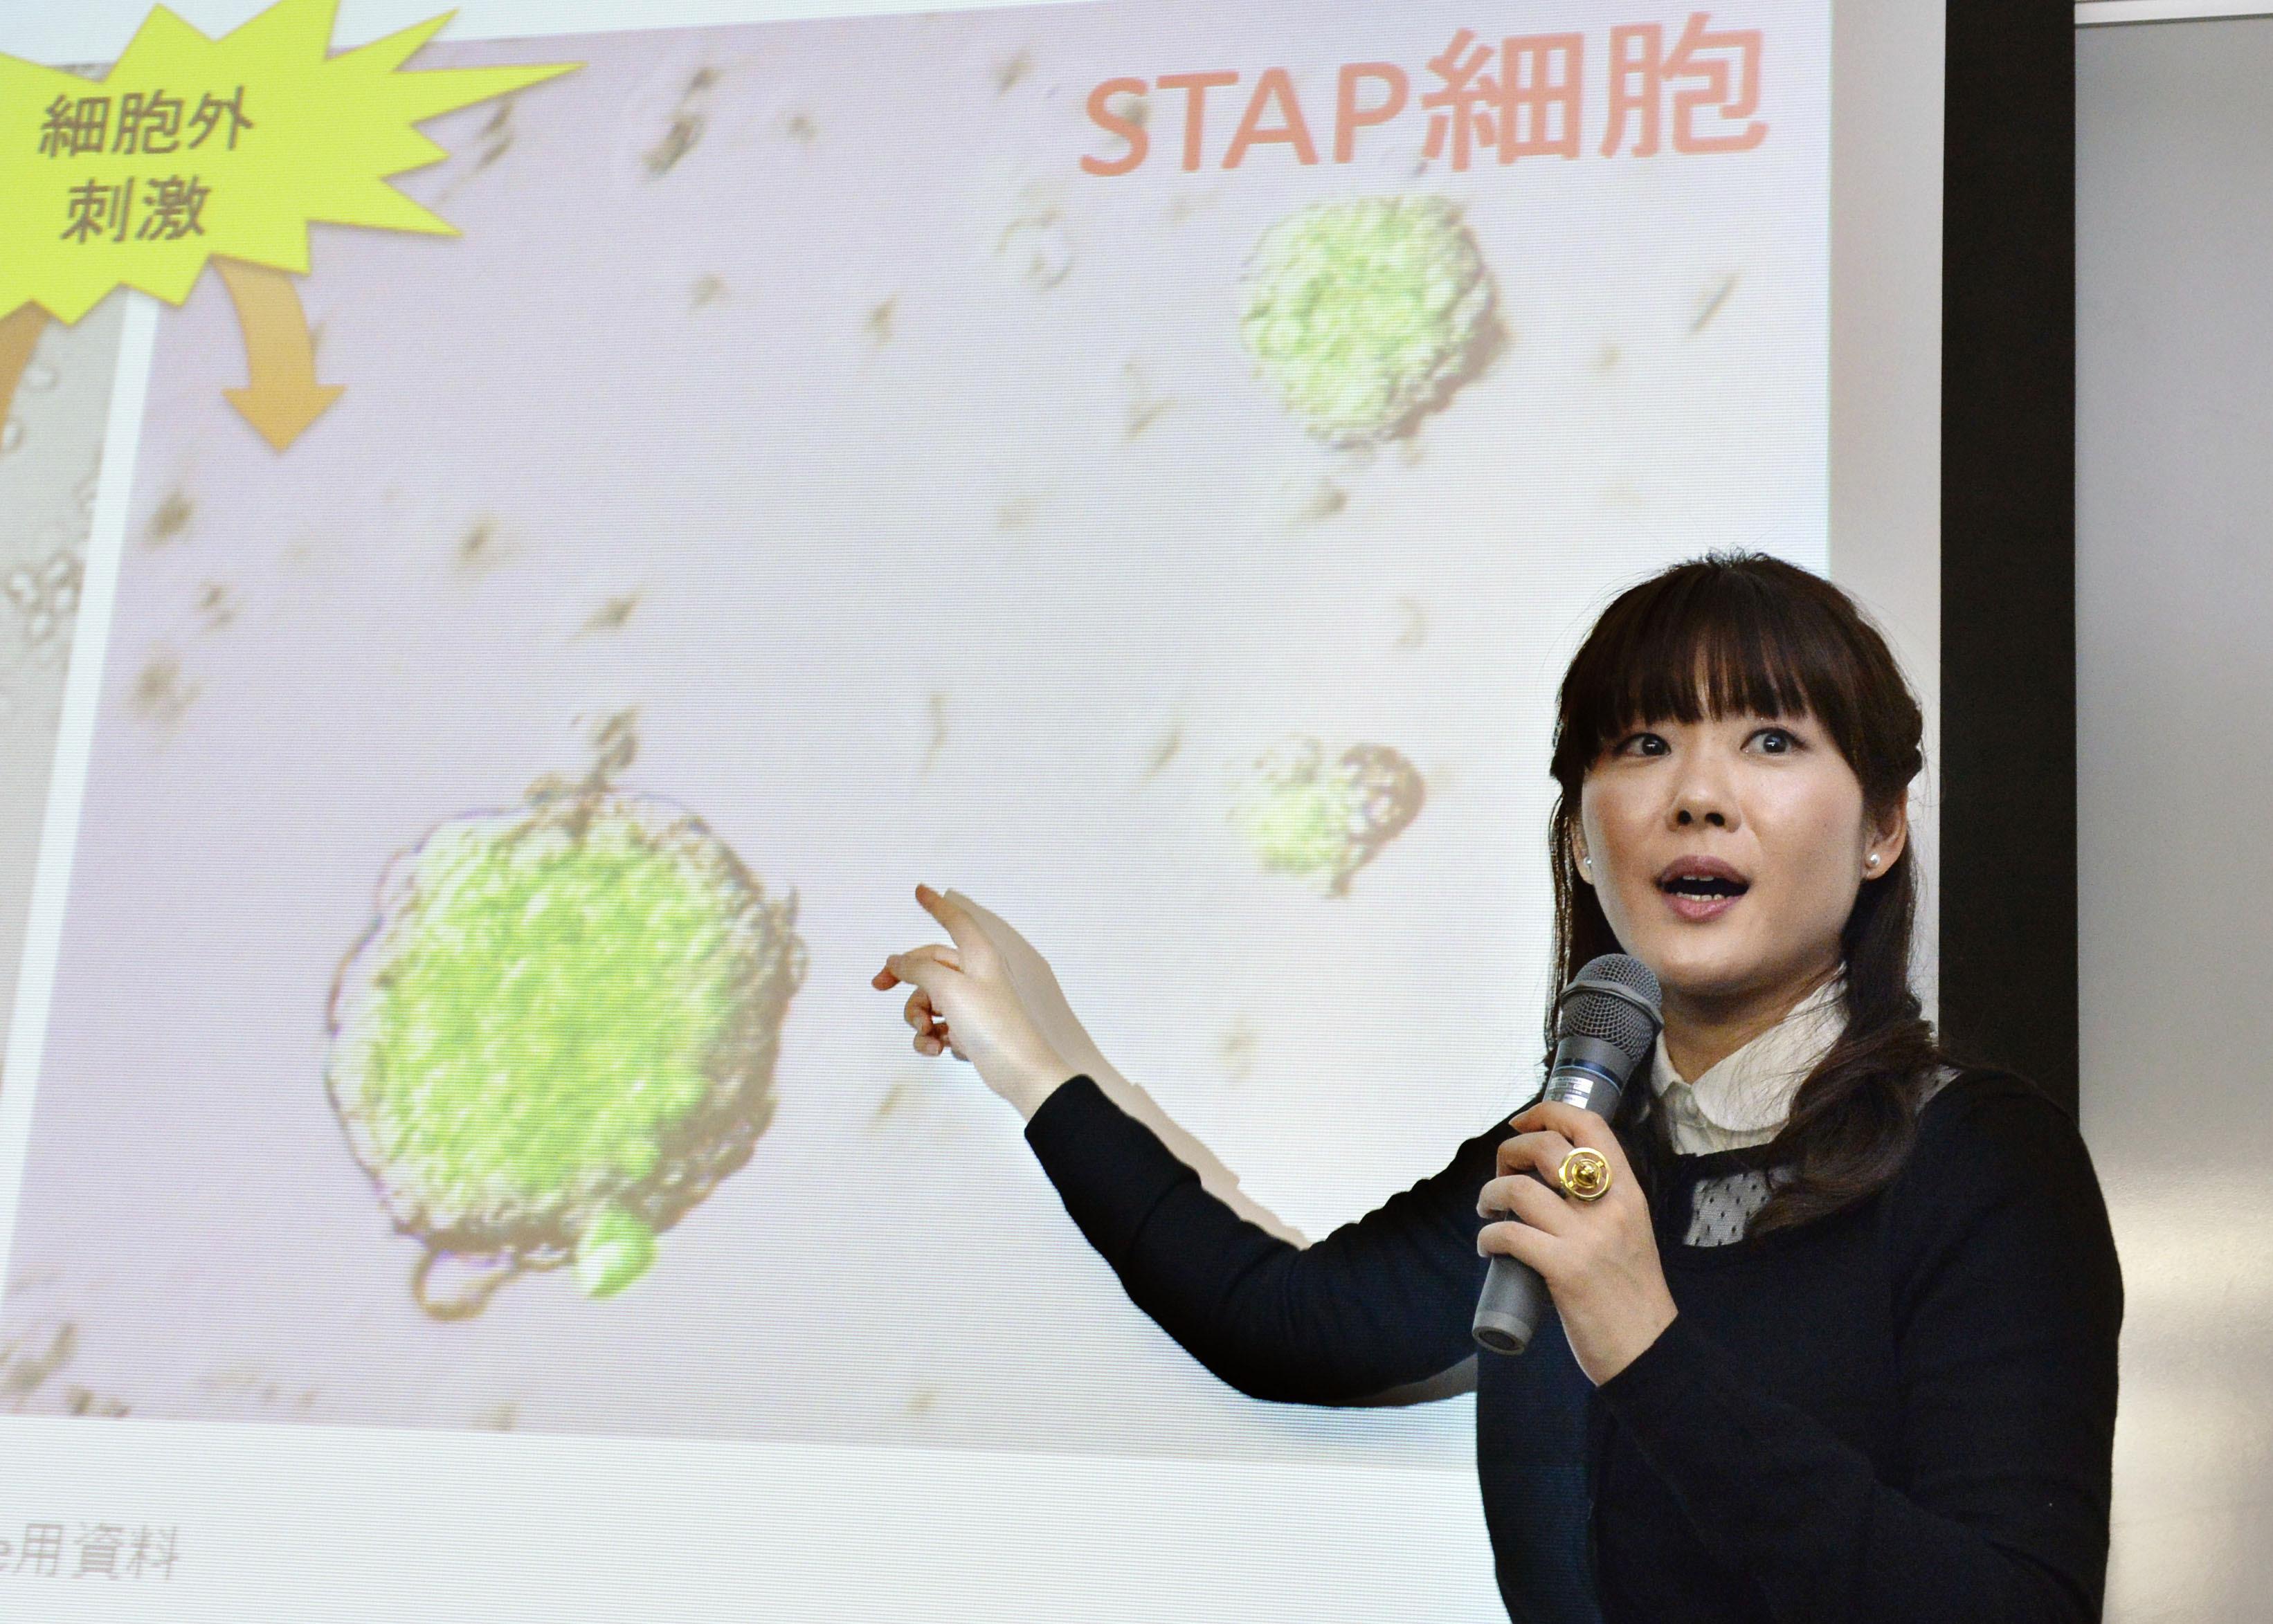 「STAP細胞」について発表する、理化学研究所発生・再生科学総合研究センターの小保方晴子氏=1月、神戸市中央区